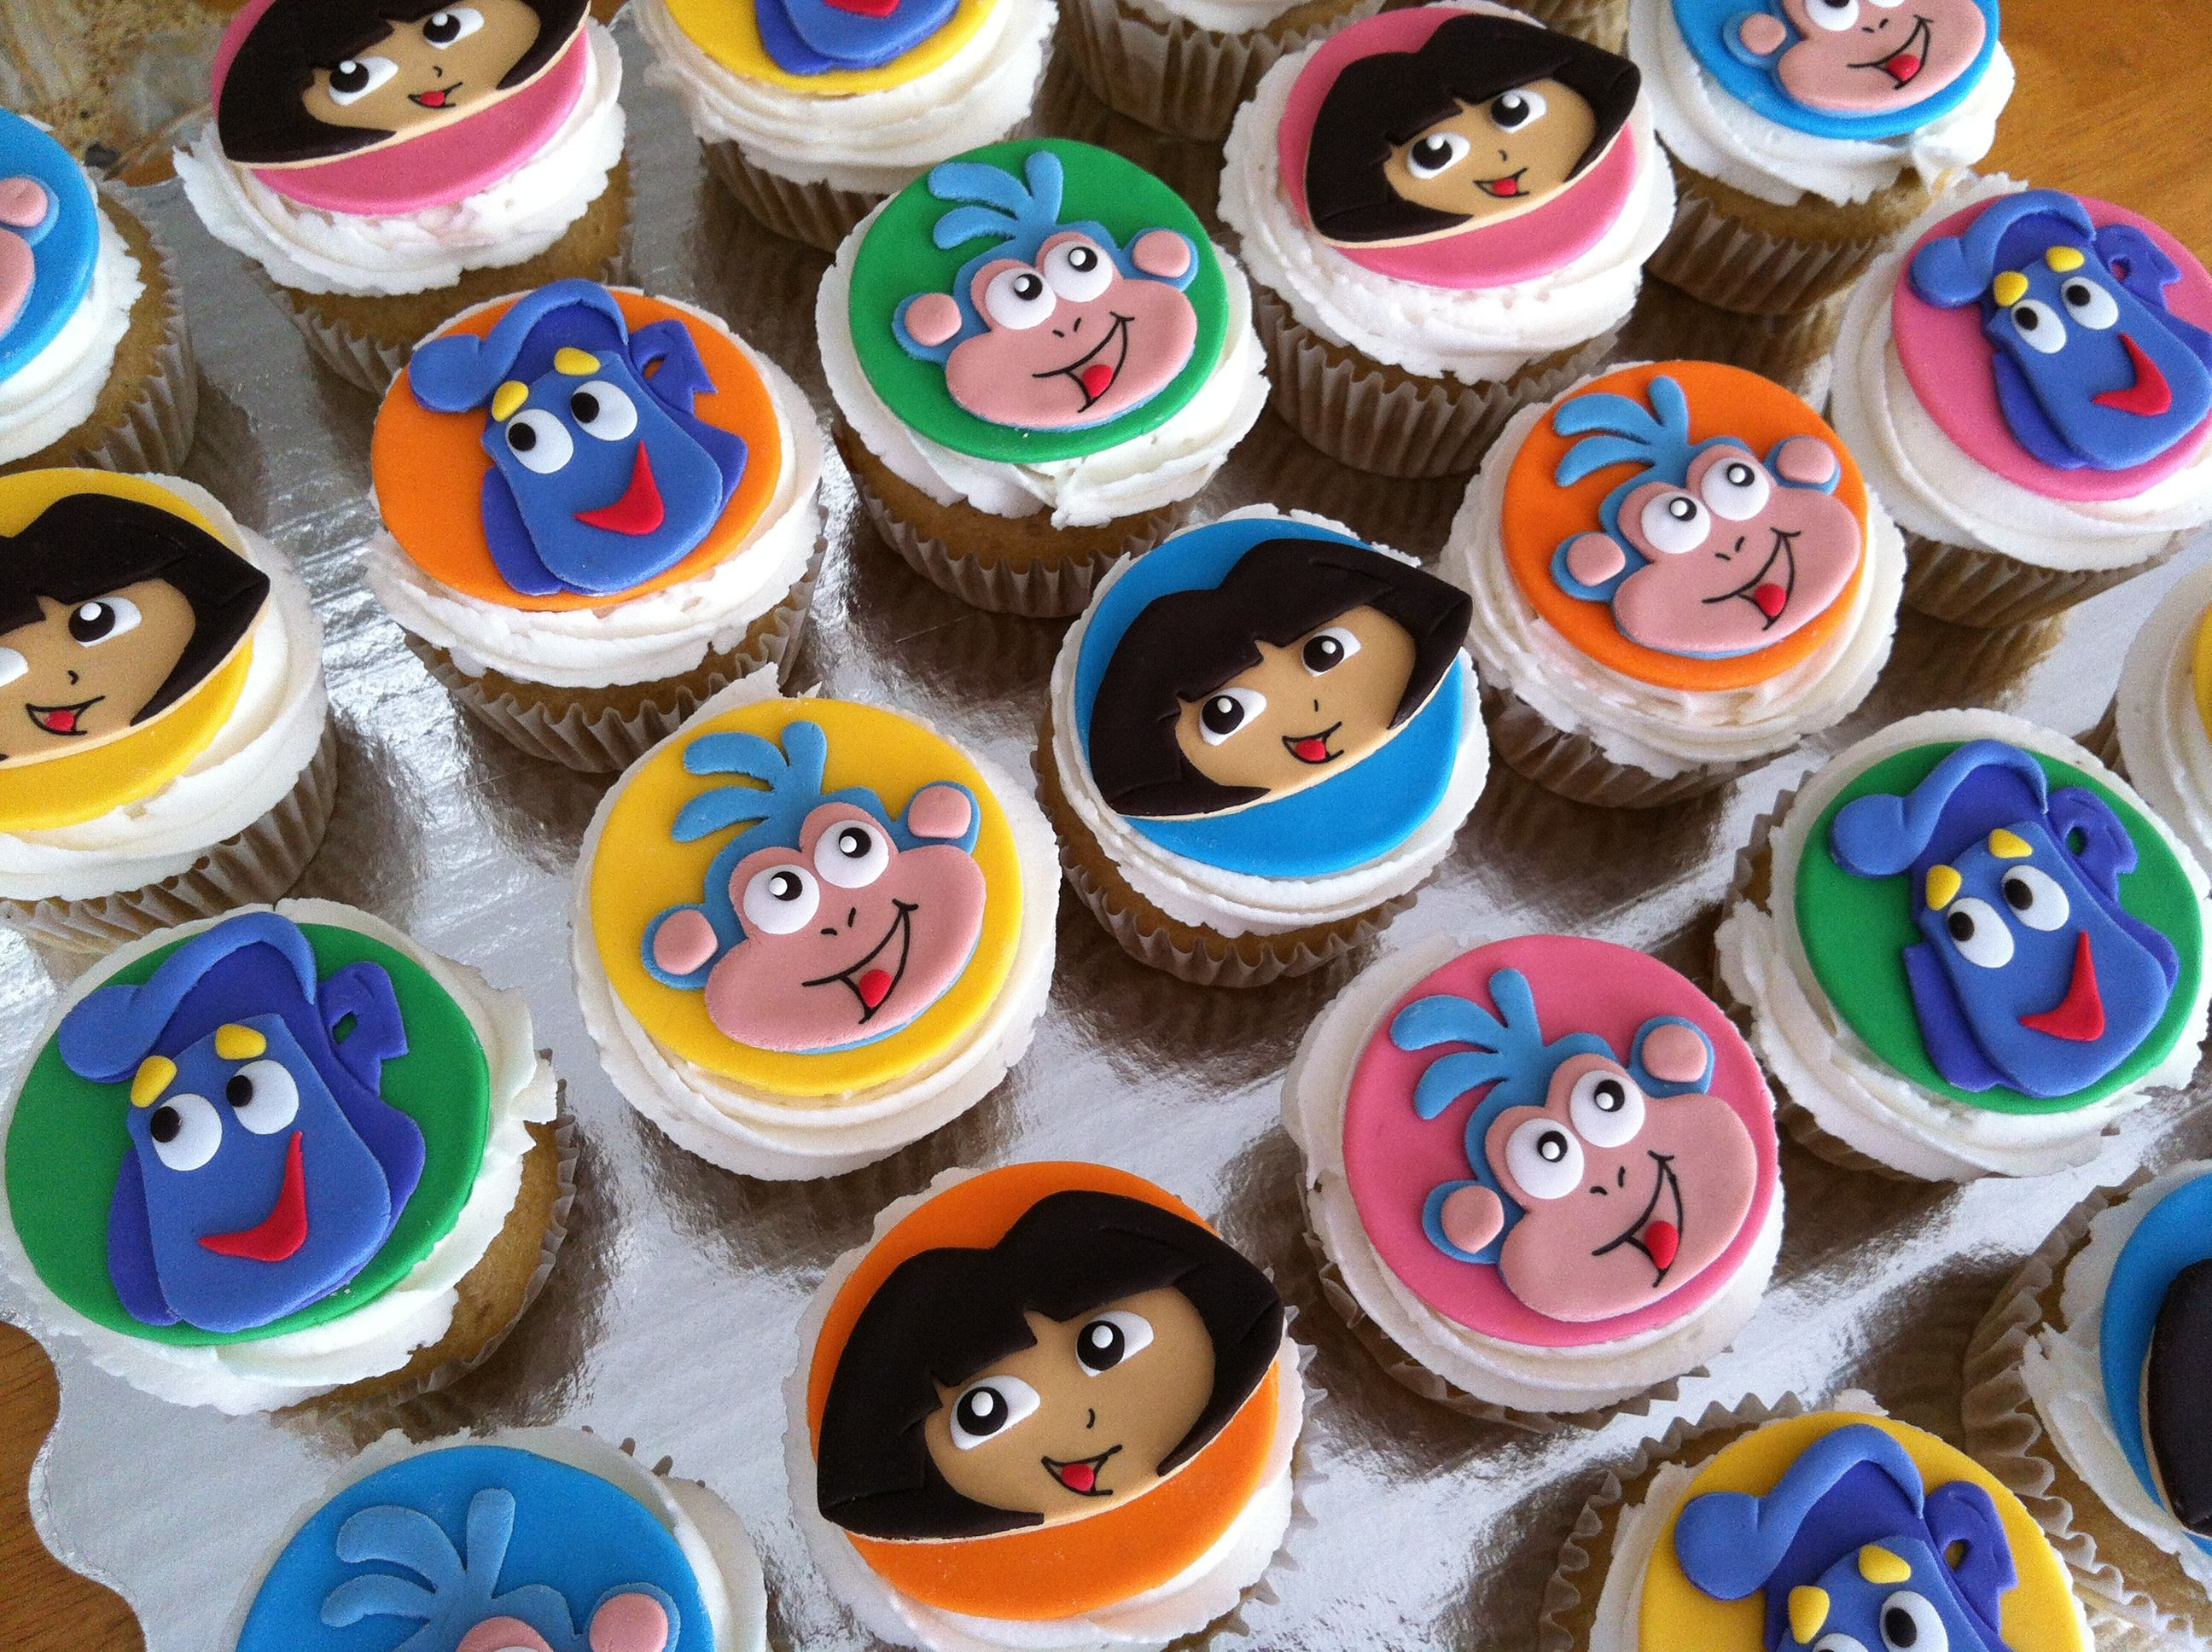 Dora\'s cupcakes | Party Ideas | Pinterest | Cake, Birthdays and Dora ...